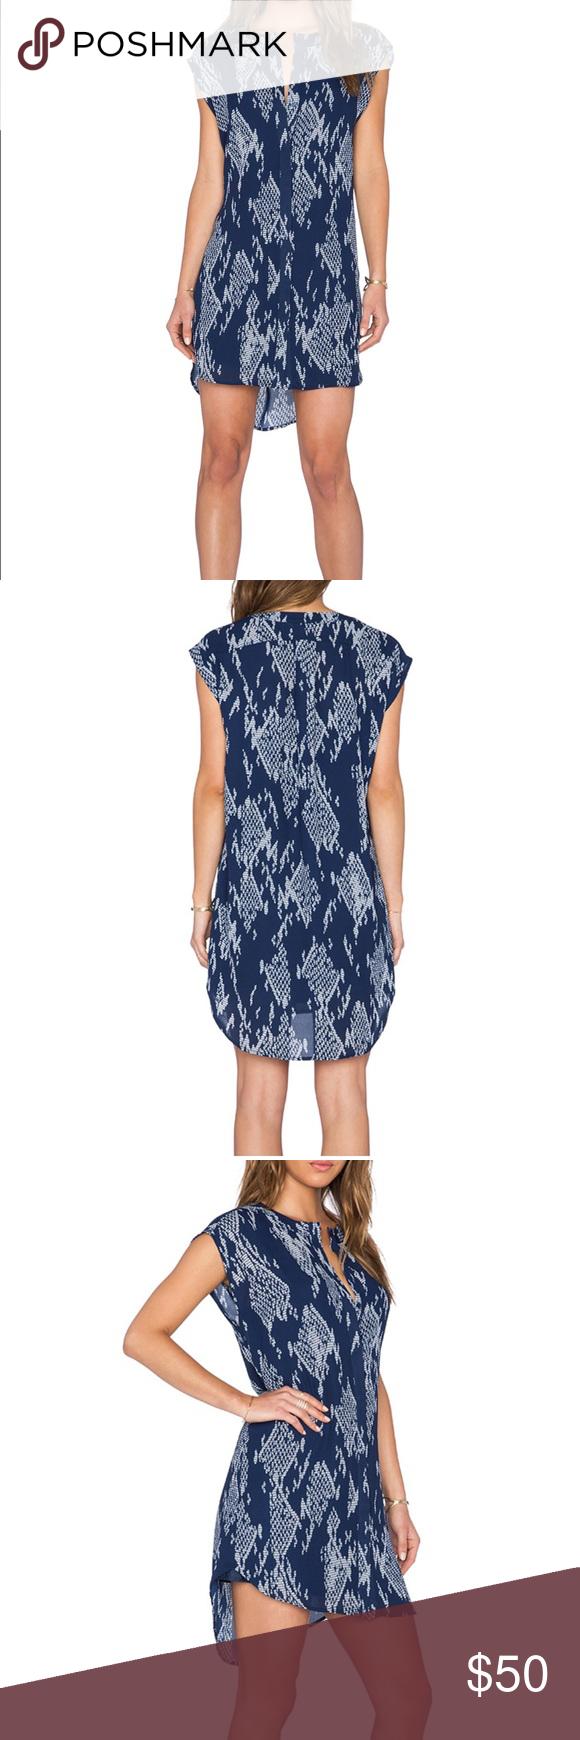 11+ Bb dakota janelle dress ideas